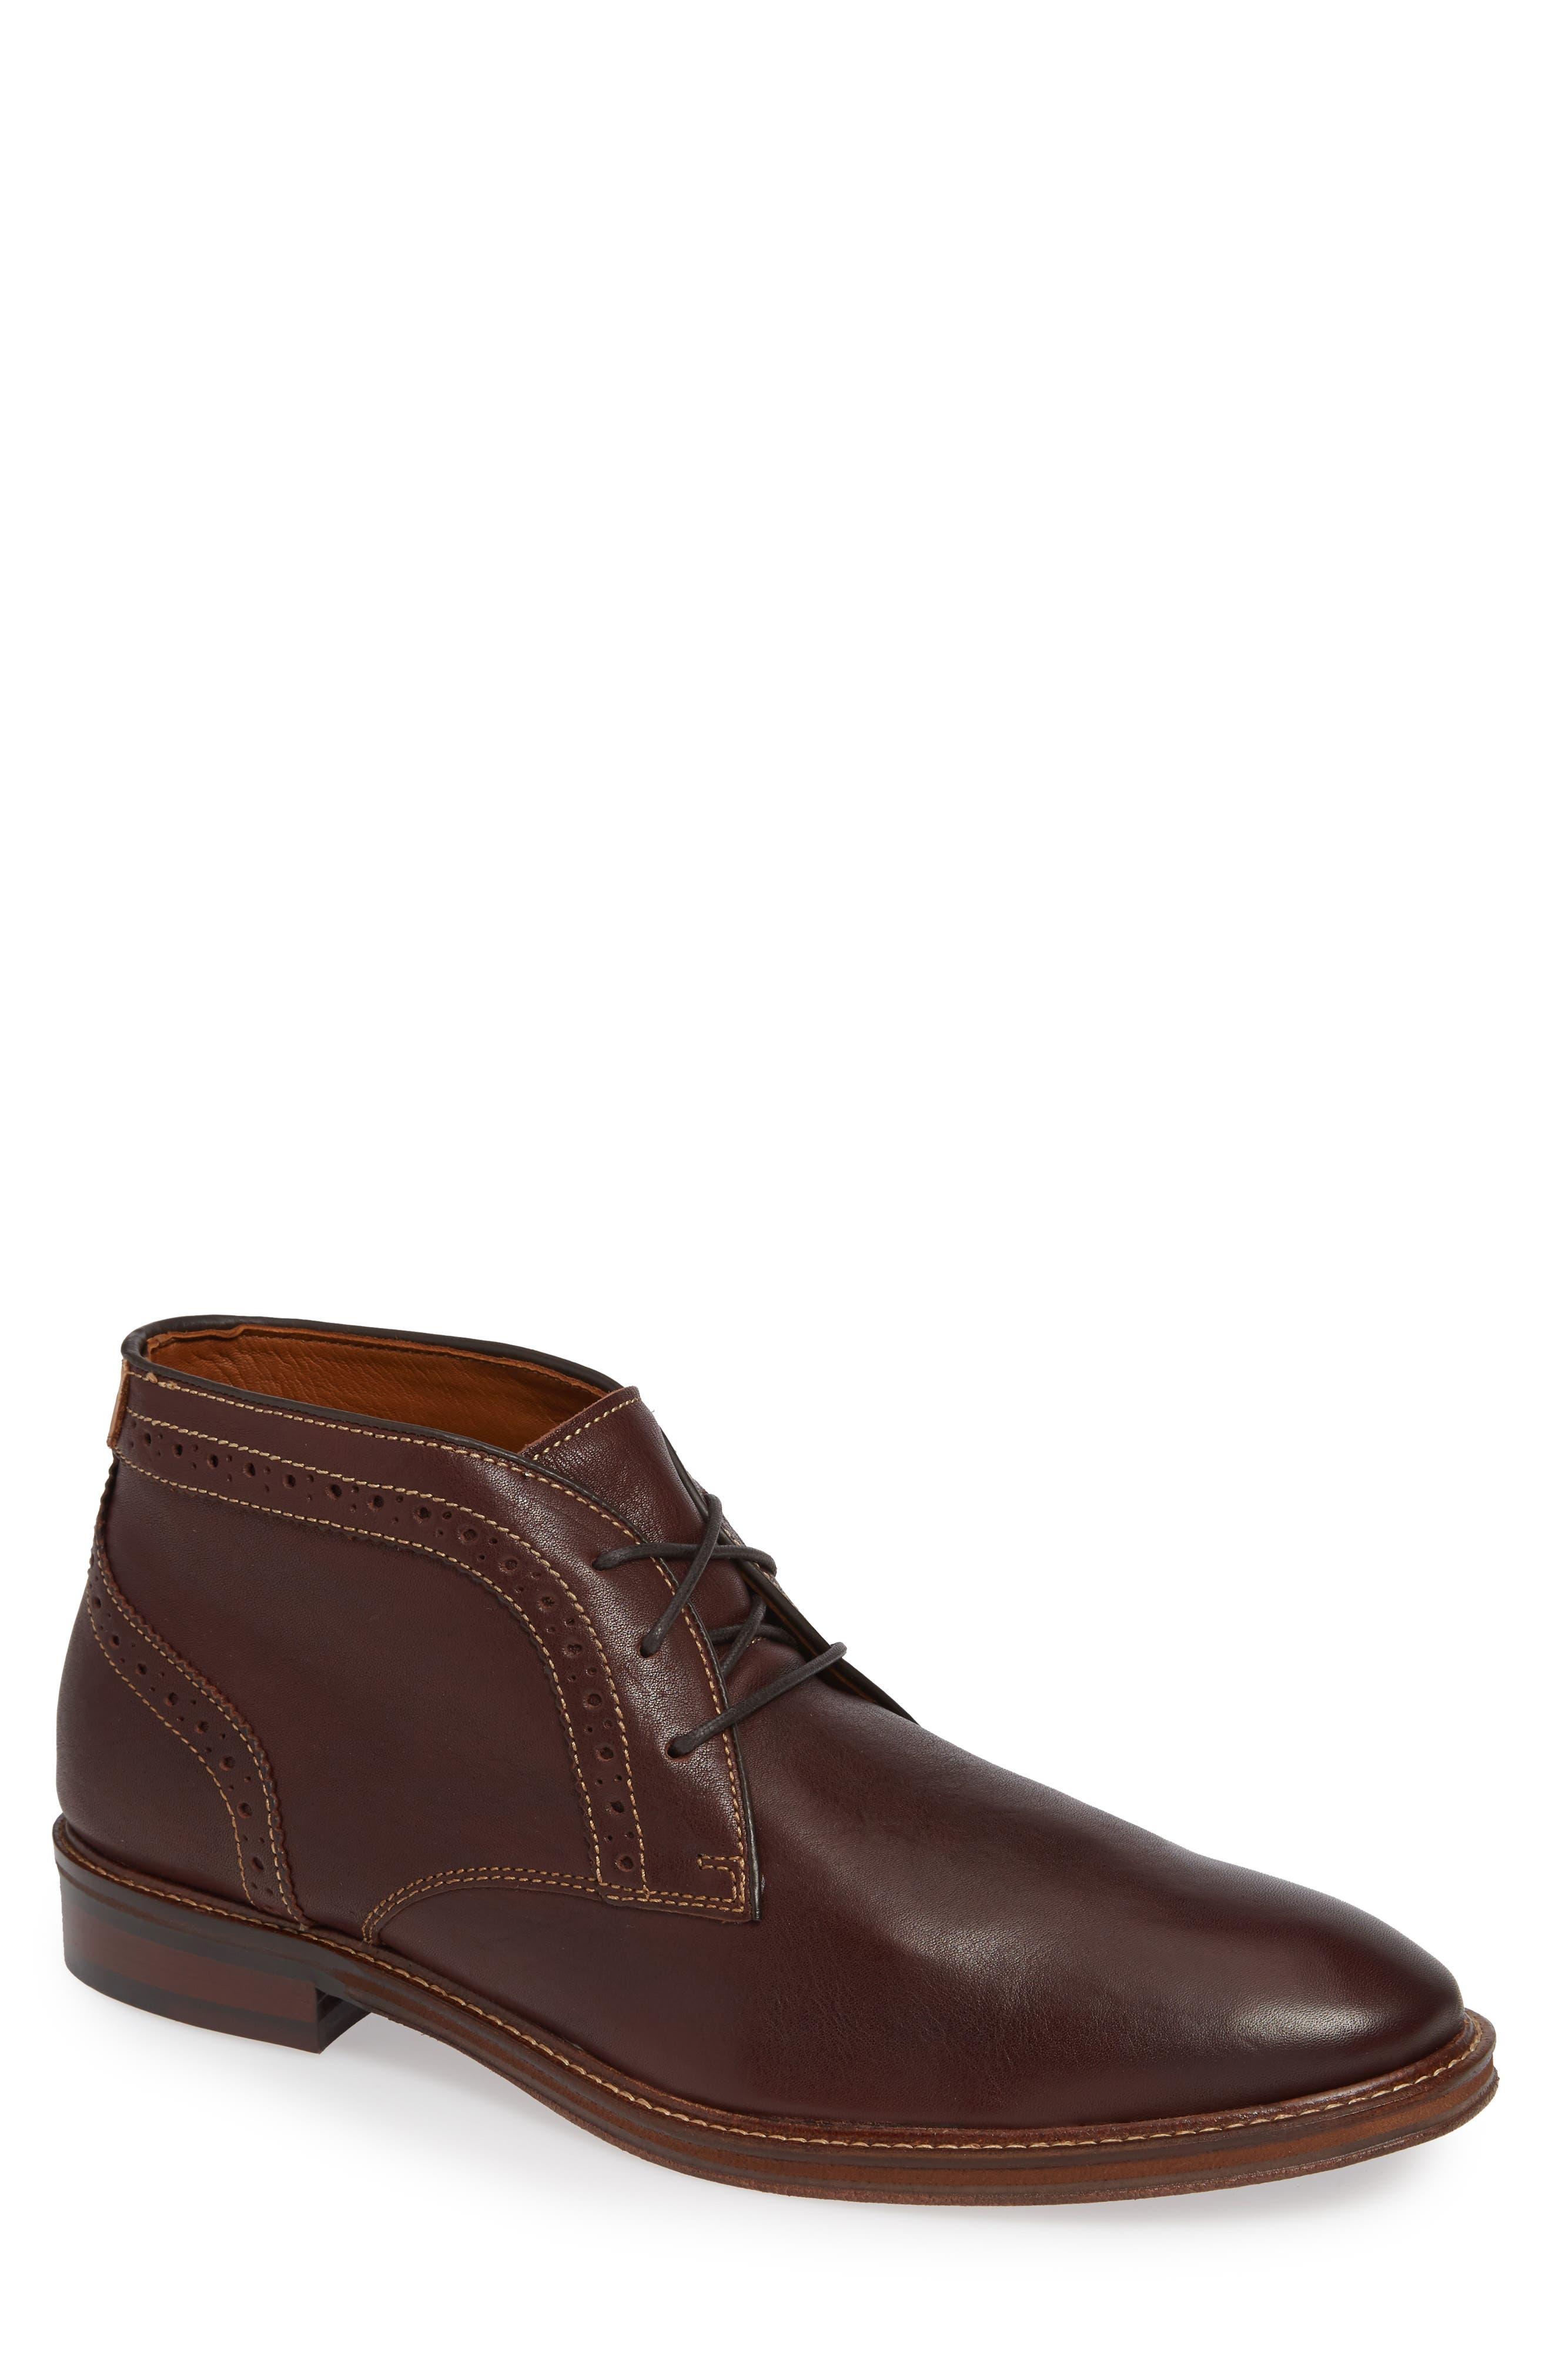 Johnston & Murphy Warner Chukka Boot, Brown